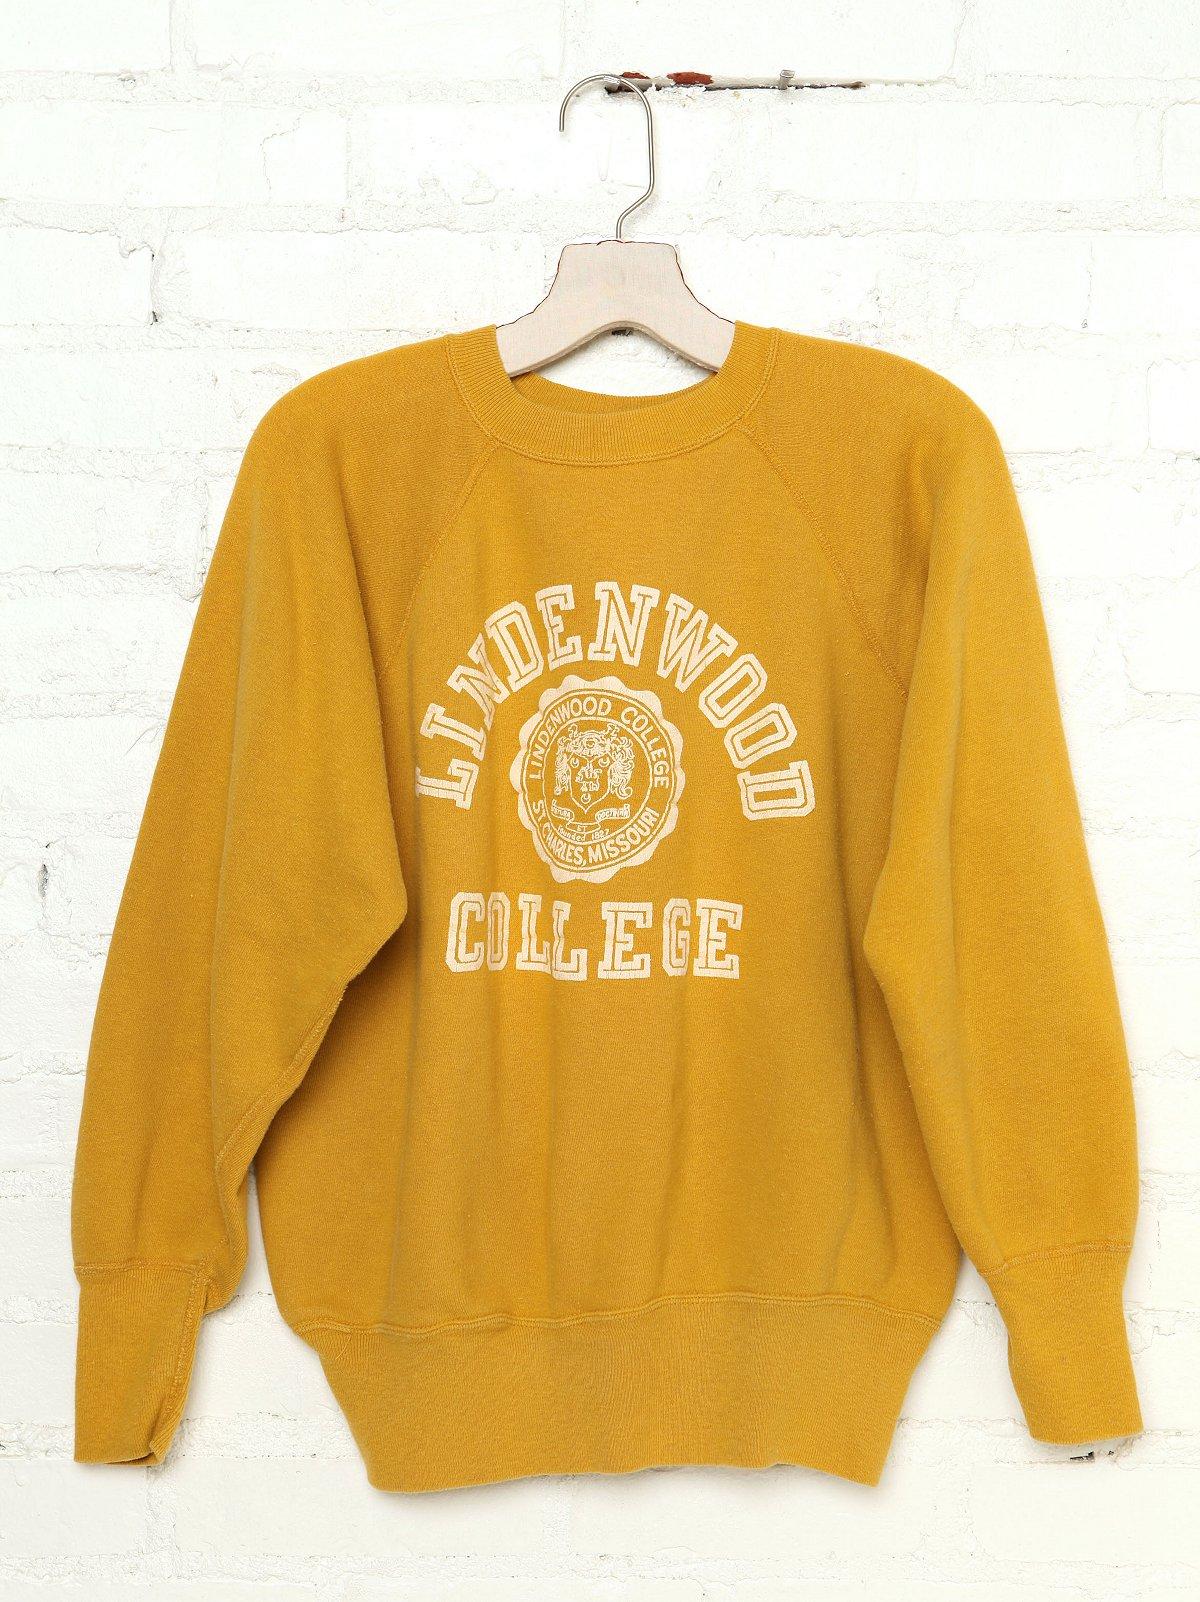 Vintage Lindenwood College Sweatshirt